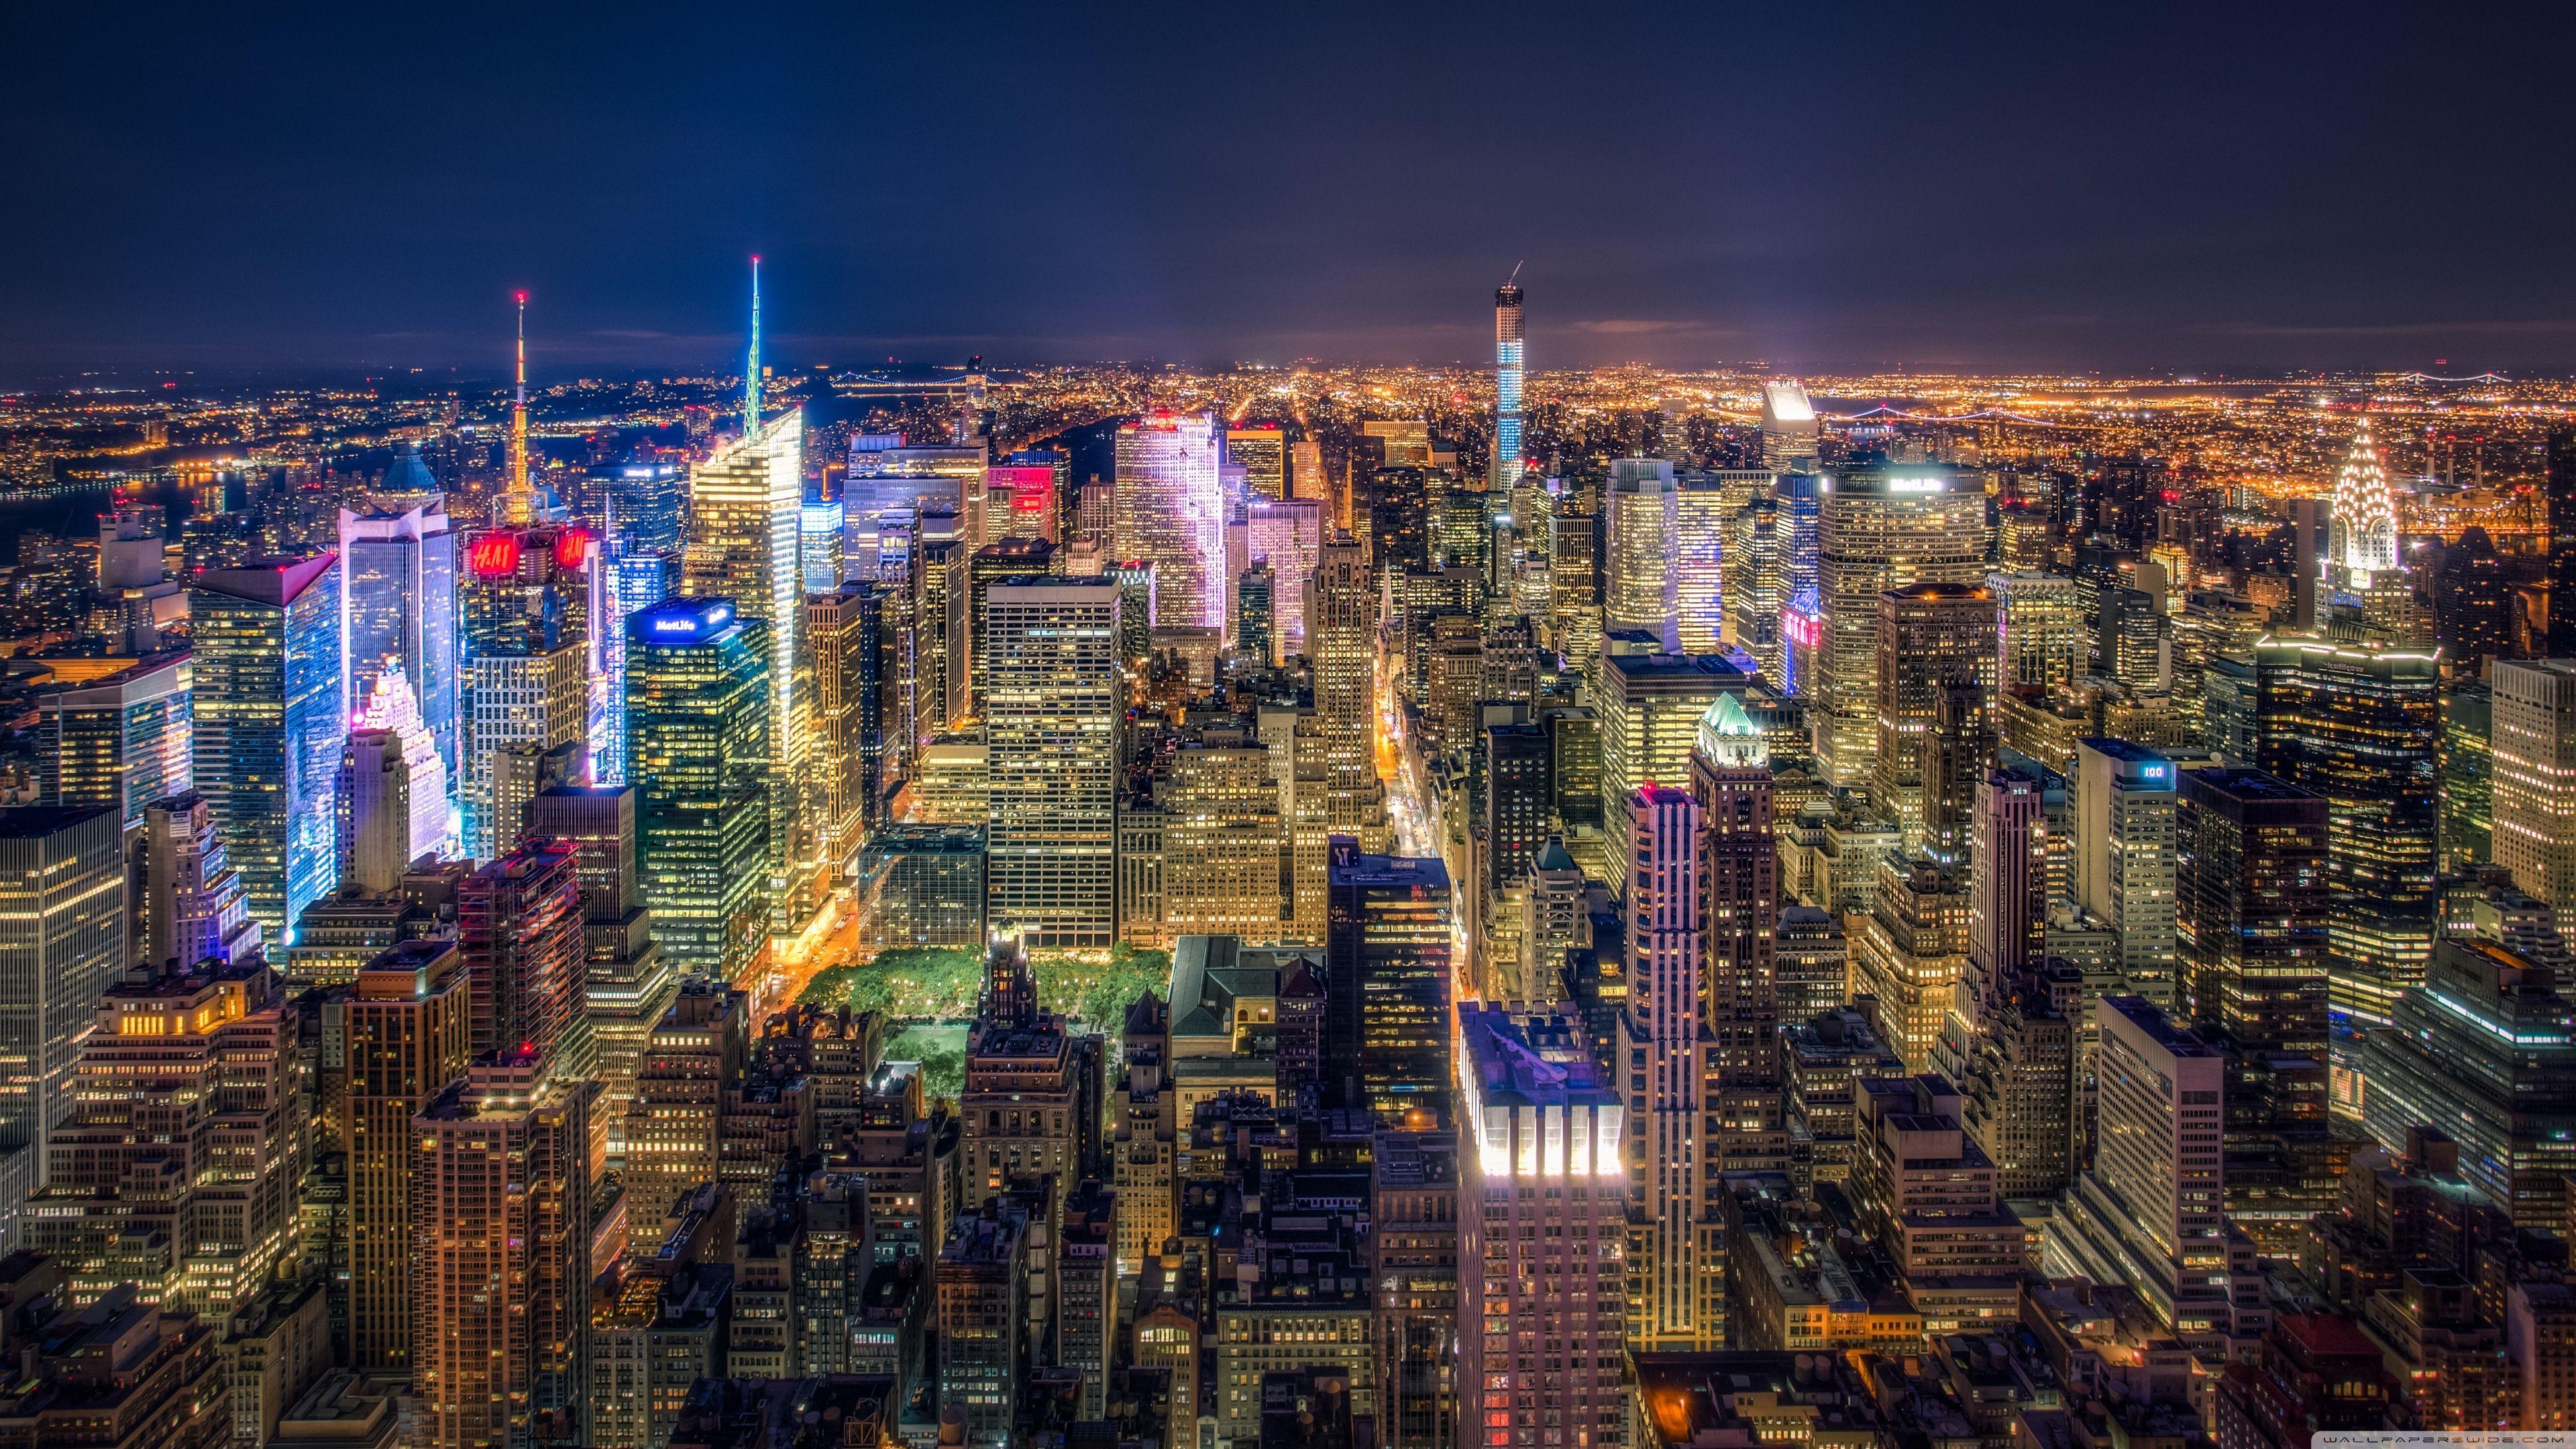 Best Of New York City At Night 4k Wallpaper Wallpaper New York City At Night New York Cityscape Night City